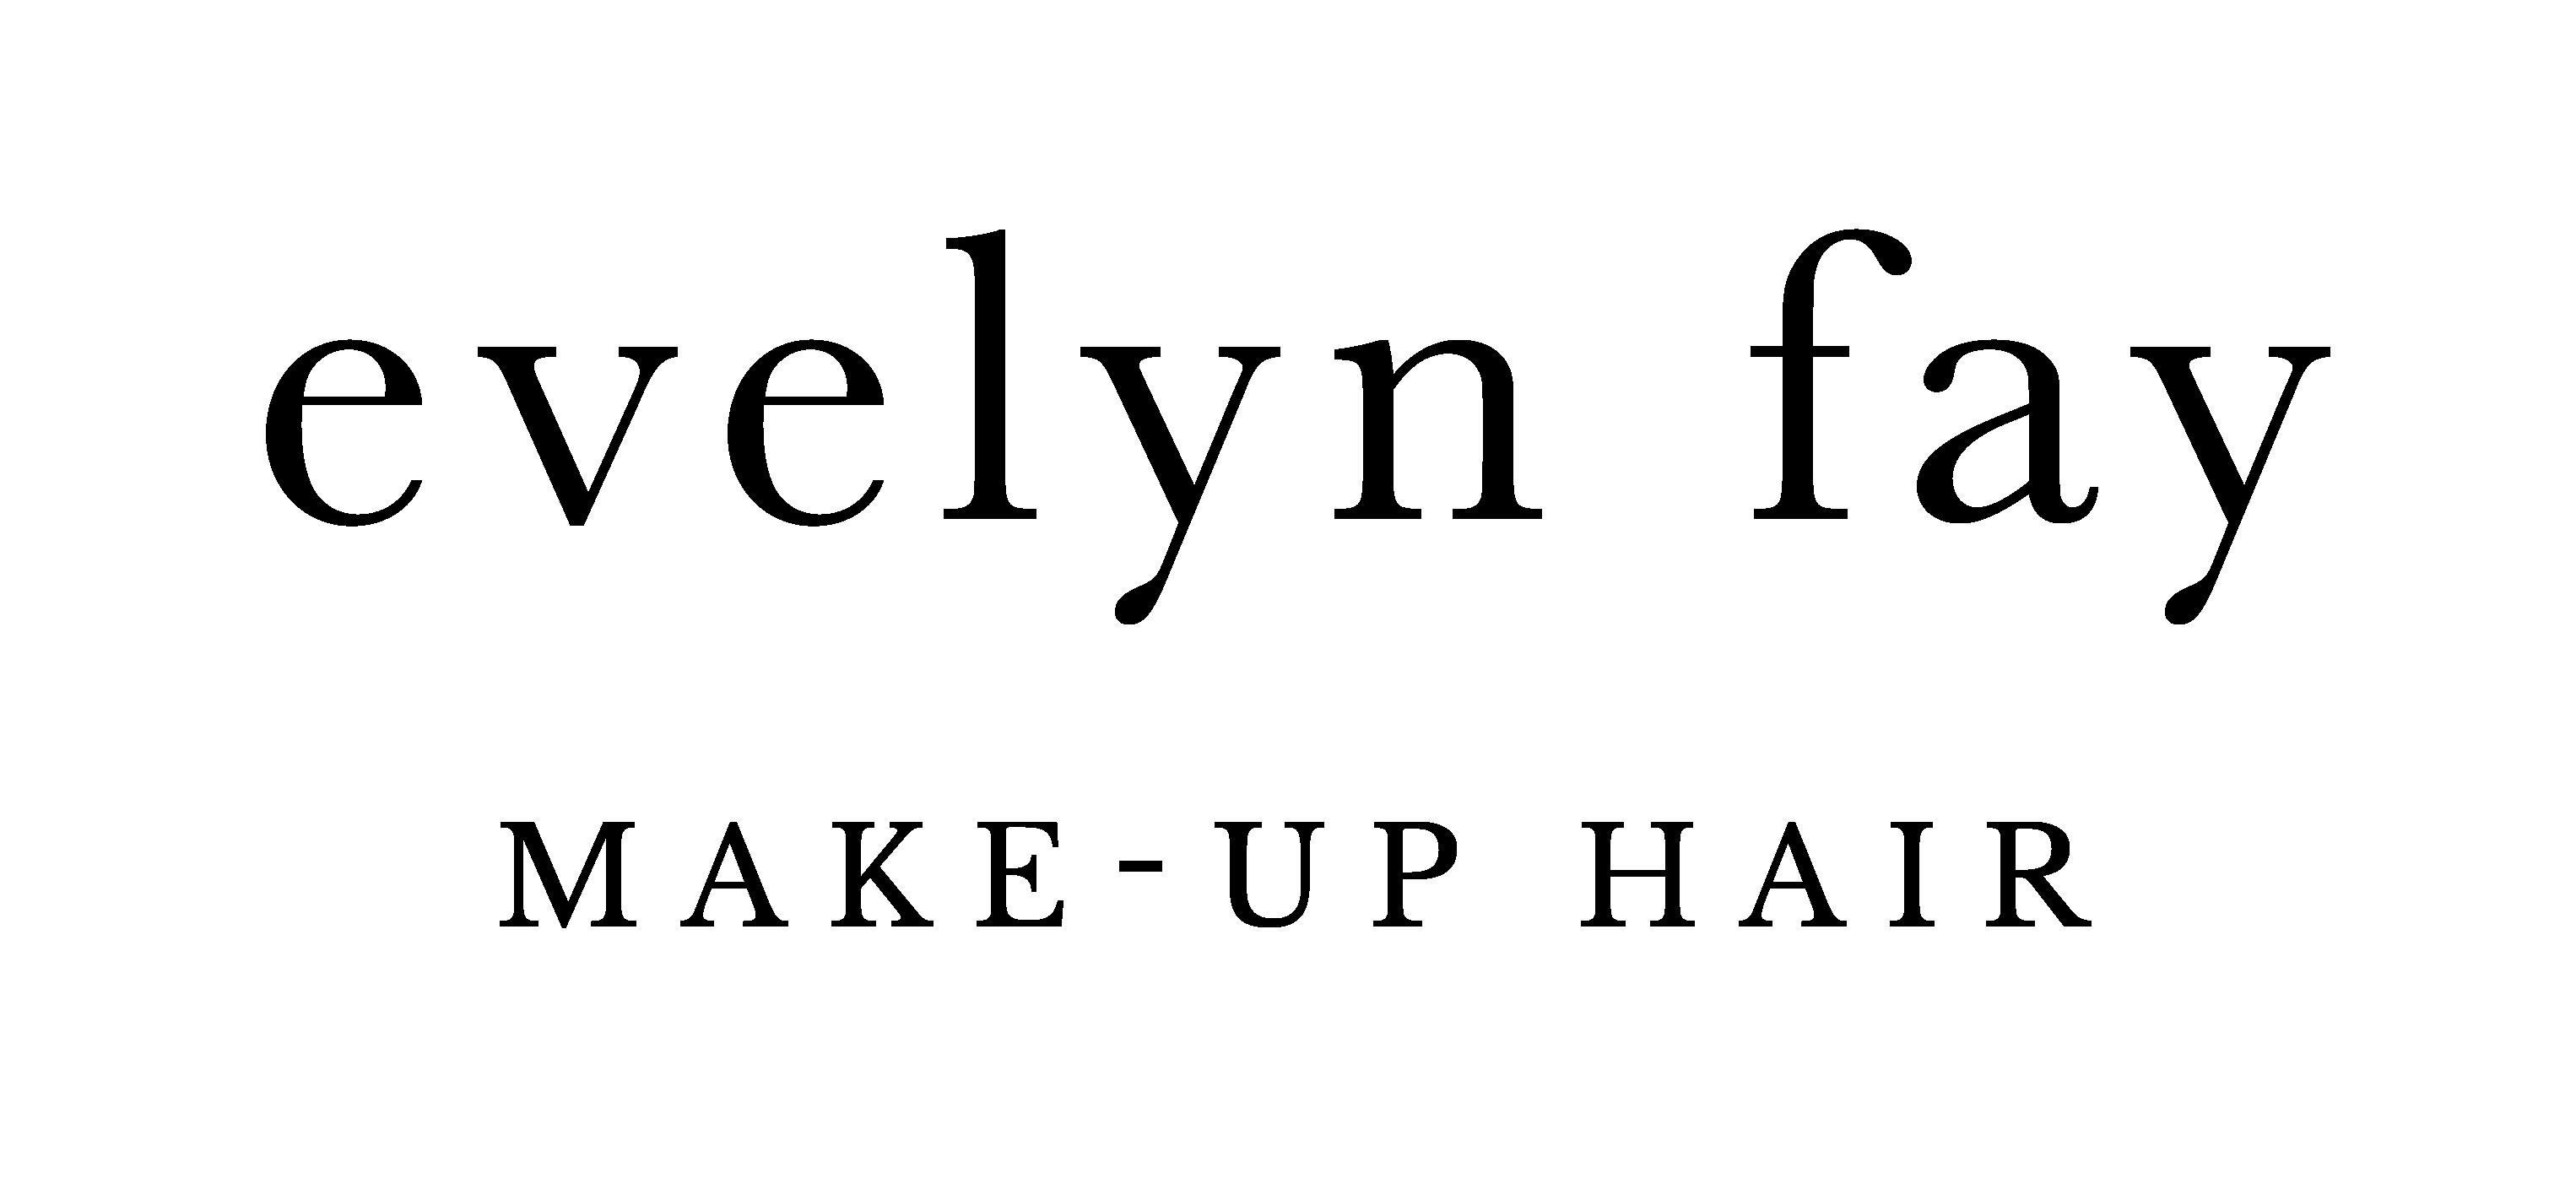 evelyn fay